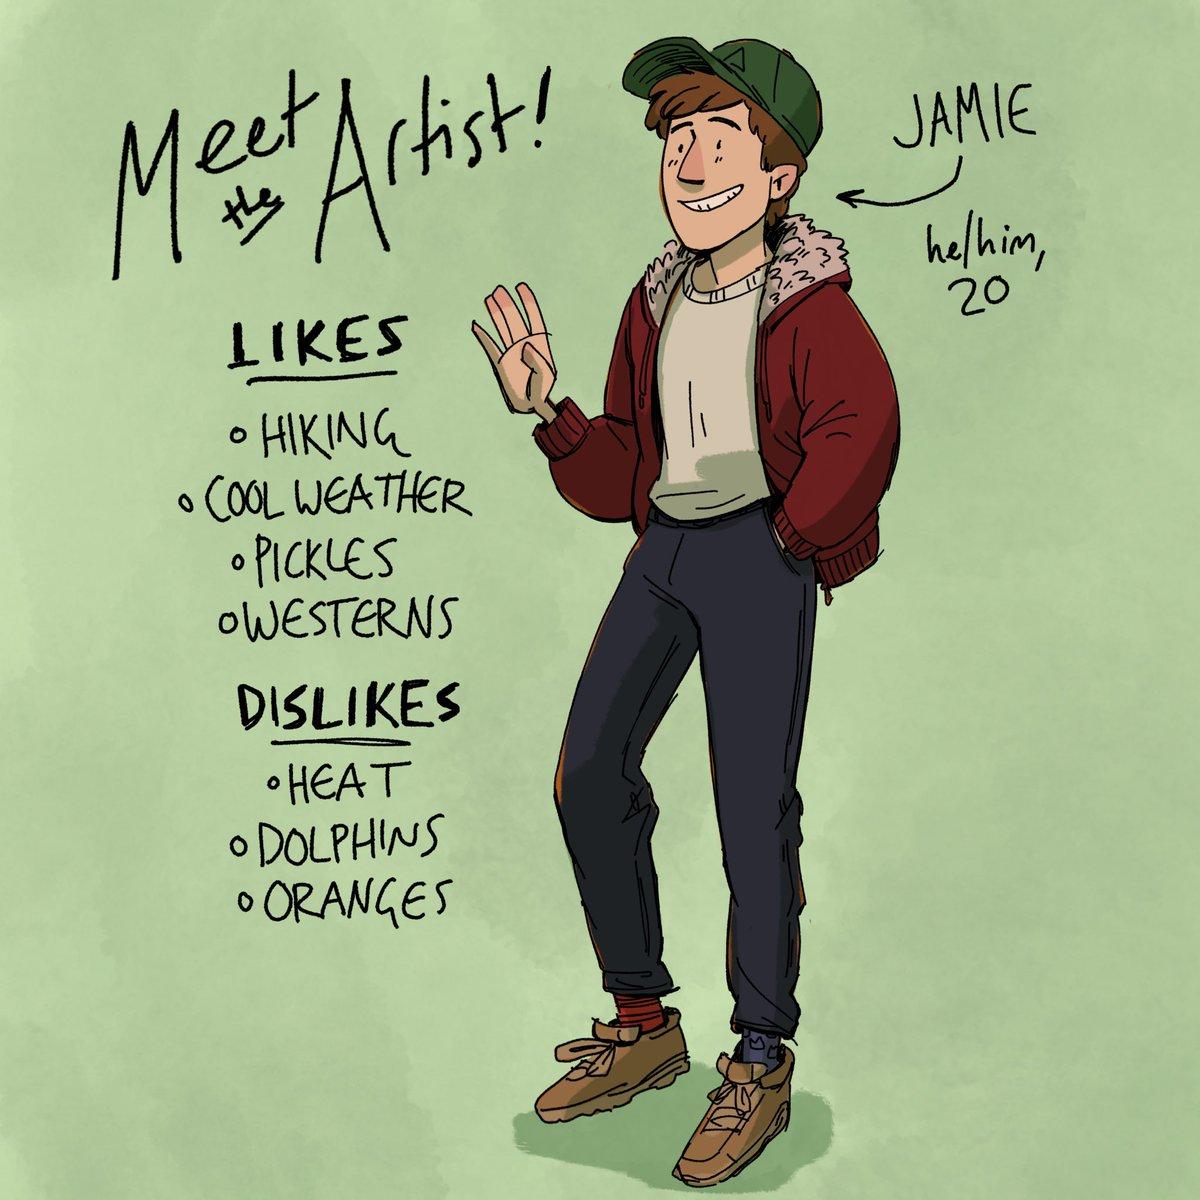 #TRANSMASCARTISTS HEY I'M JAMIE! i draw comics and fantasy stuff <br>http://pic.twitter.com/JDyRQRXHjr